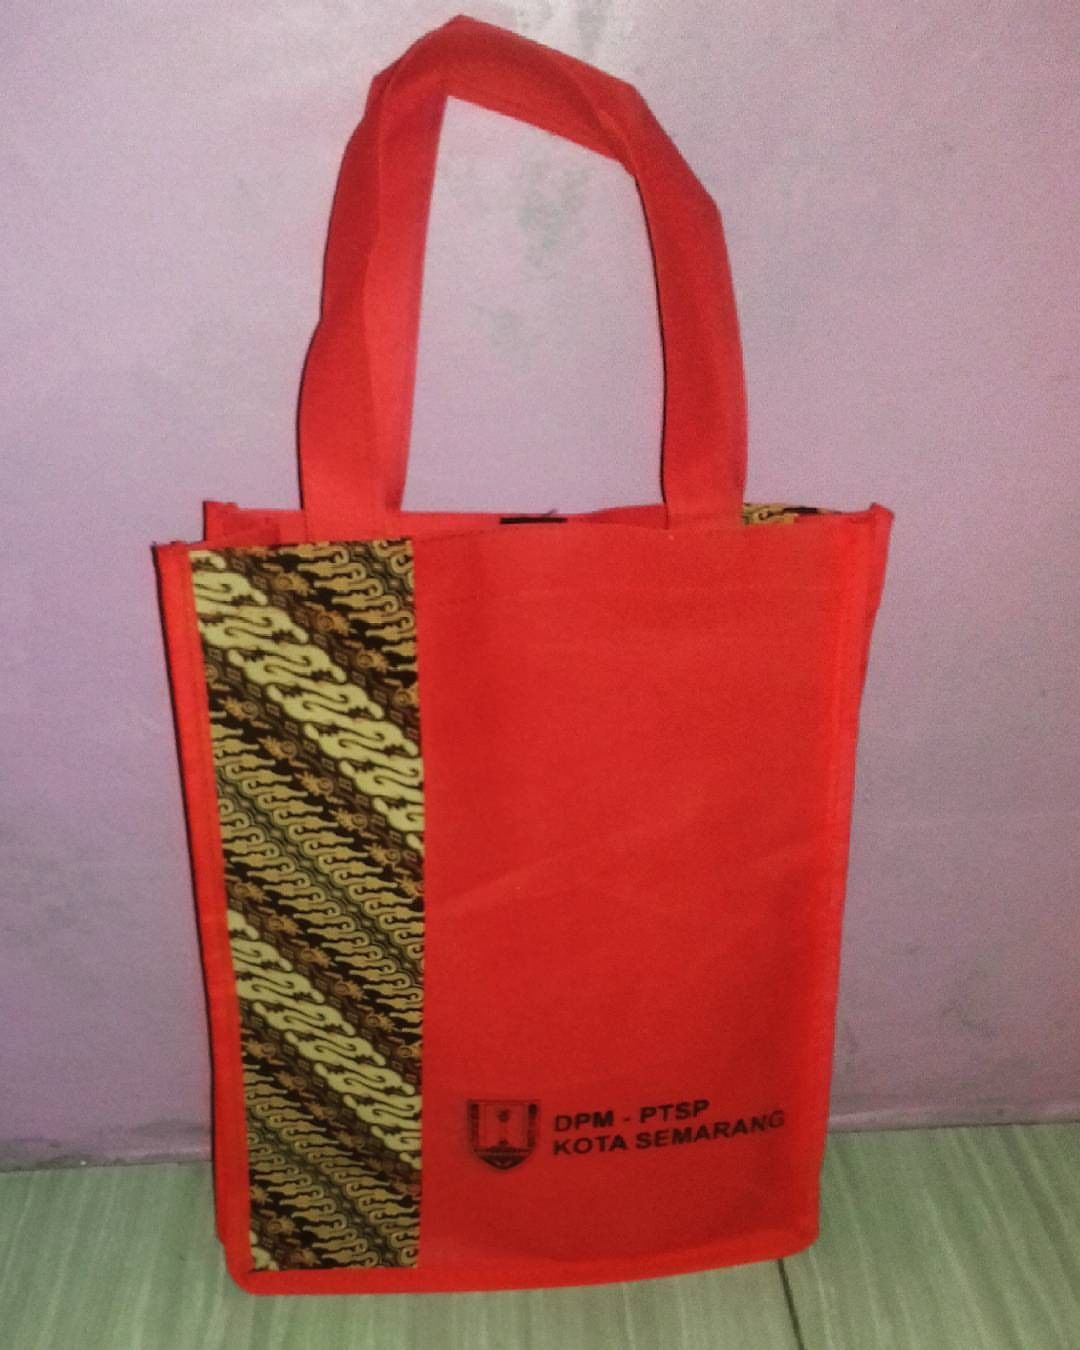 tas spunbond tas berkat seminar batik